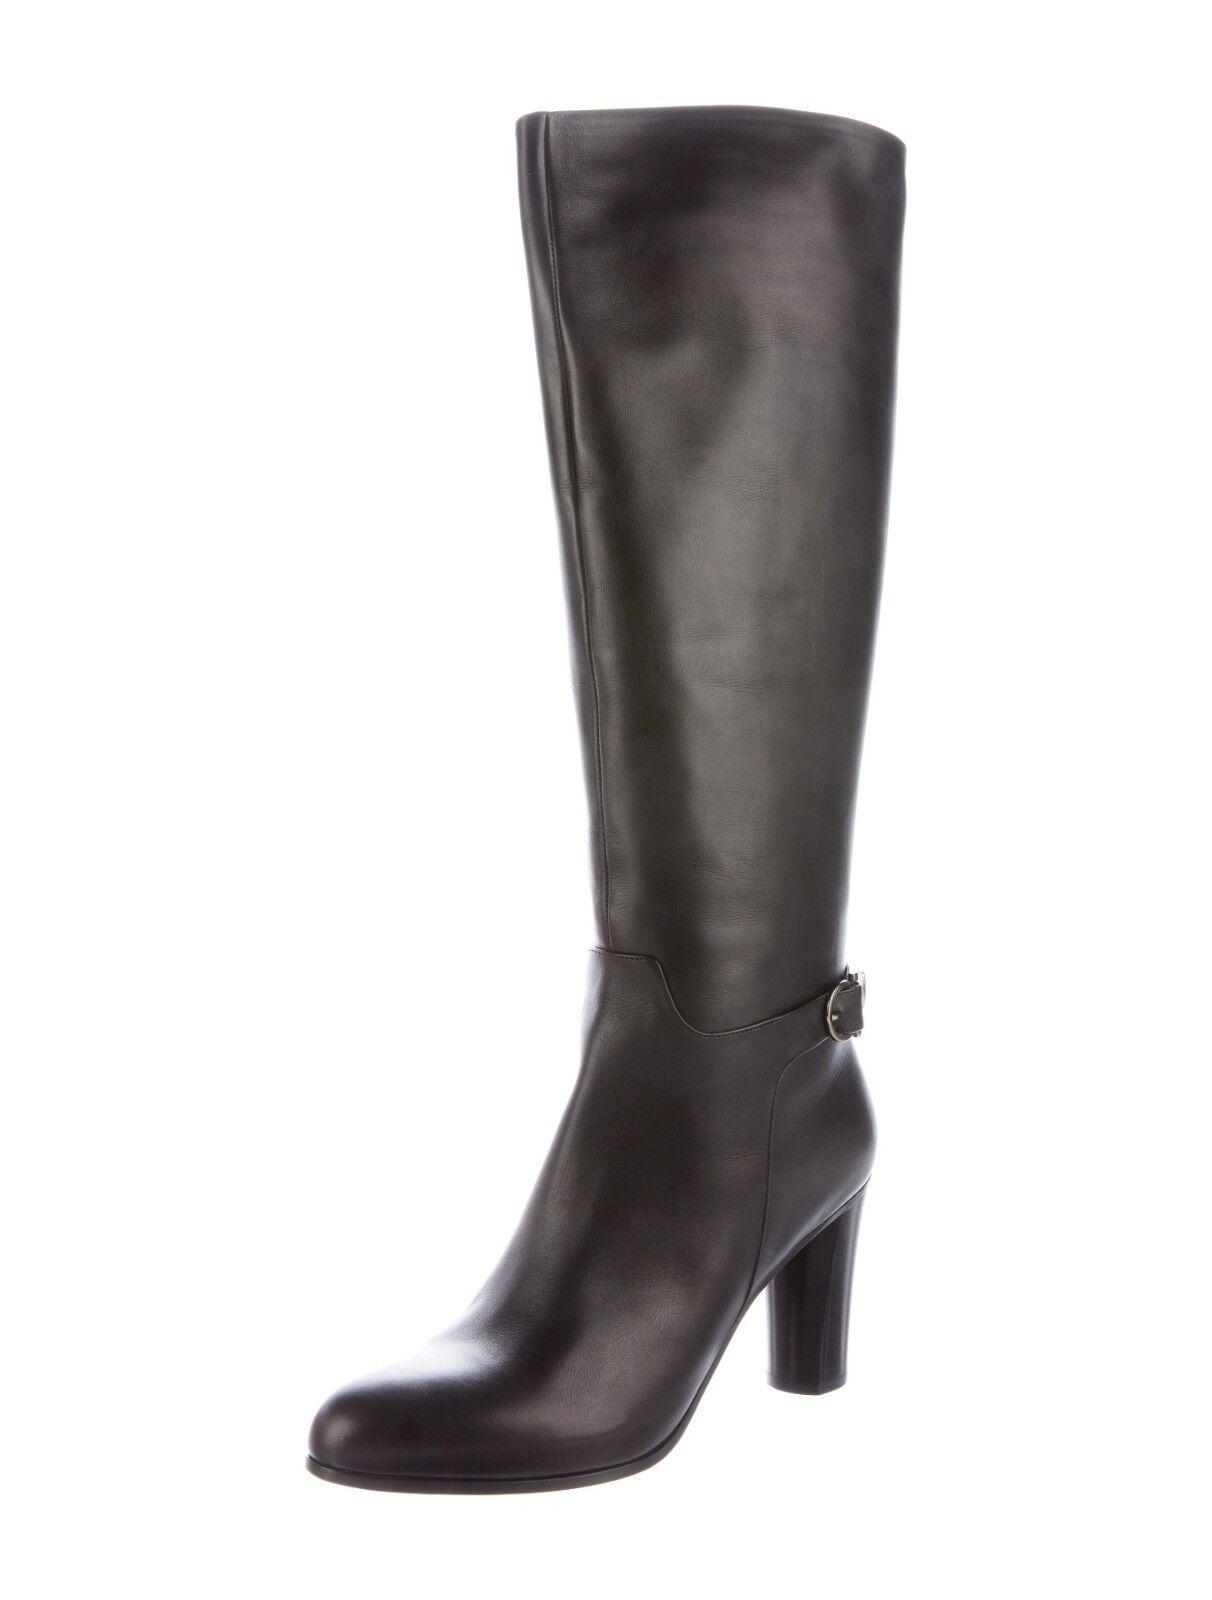 New Salvatore Ferragamo 9.5 Florisa Smooth Leather braun Tall Stiefel Buckle Heel